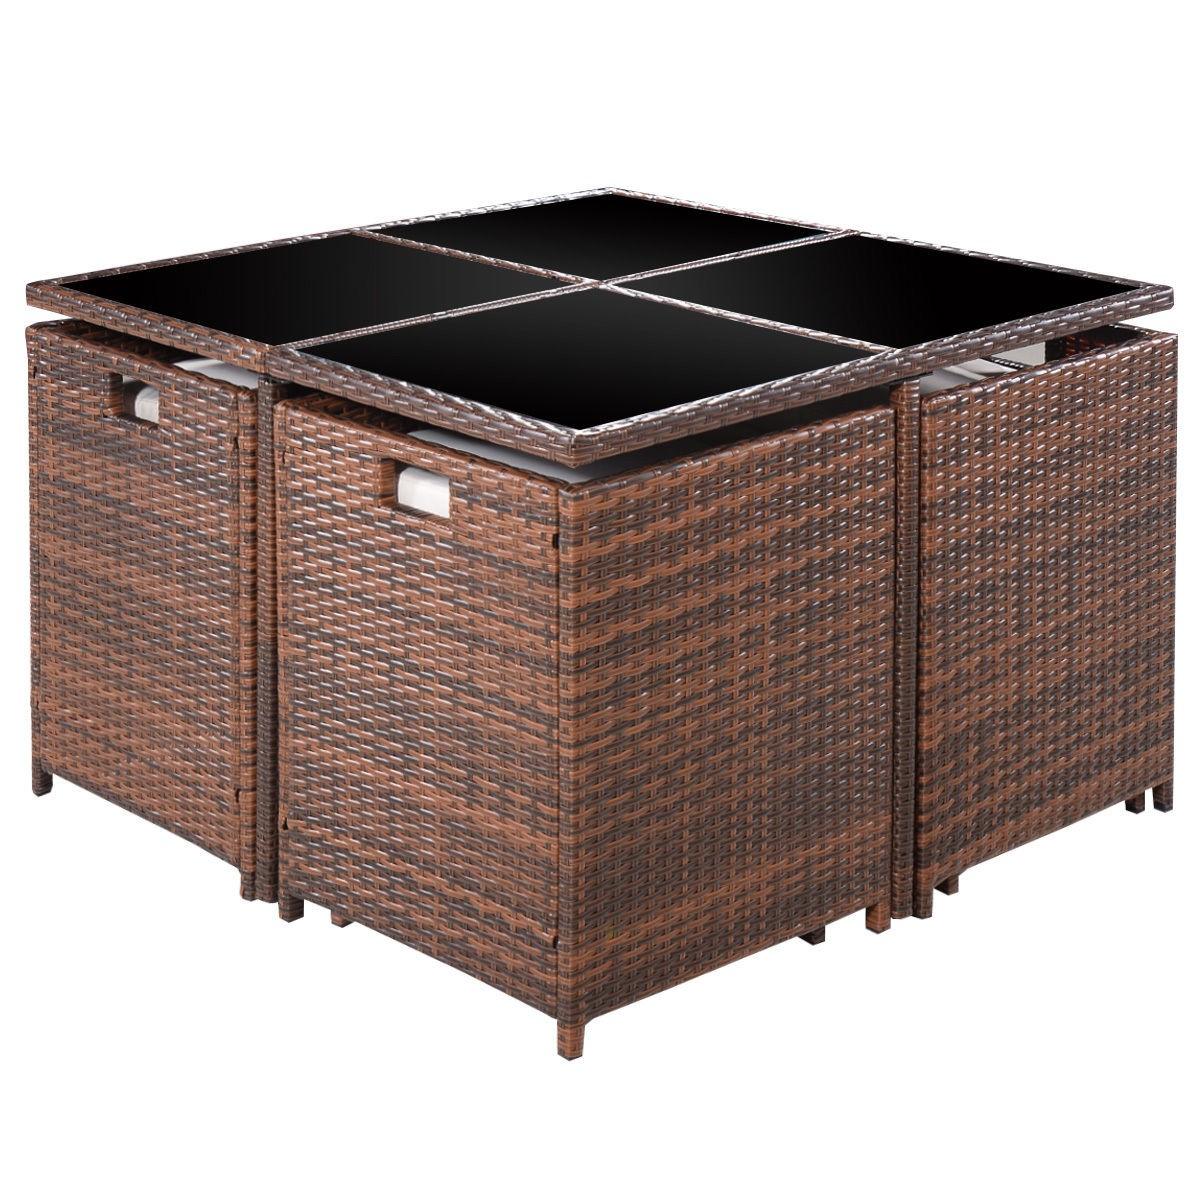 Brown 9 Pc Mix Patio Garden Rattan Wicker Sofa Set Furniture Cushioned W Ottoman